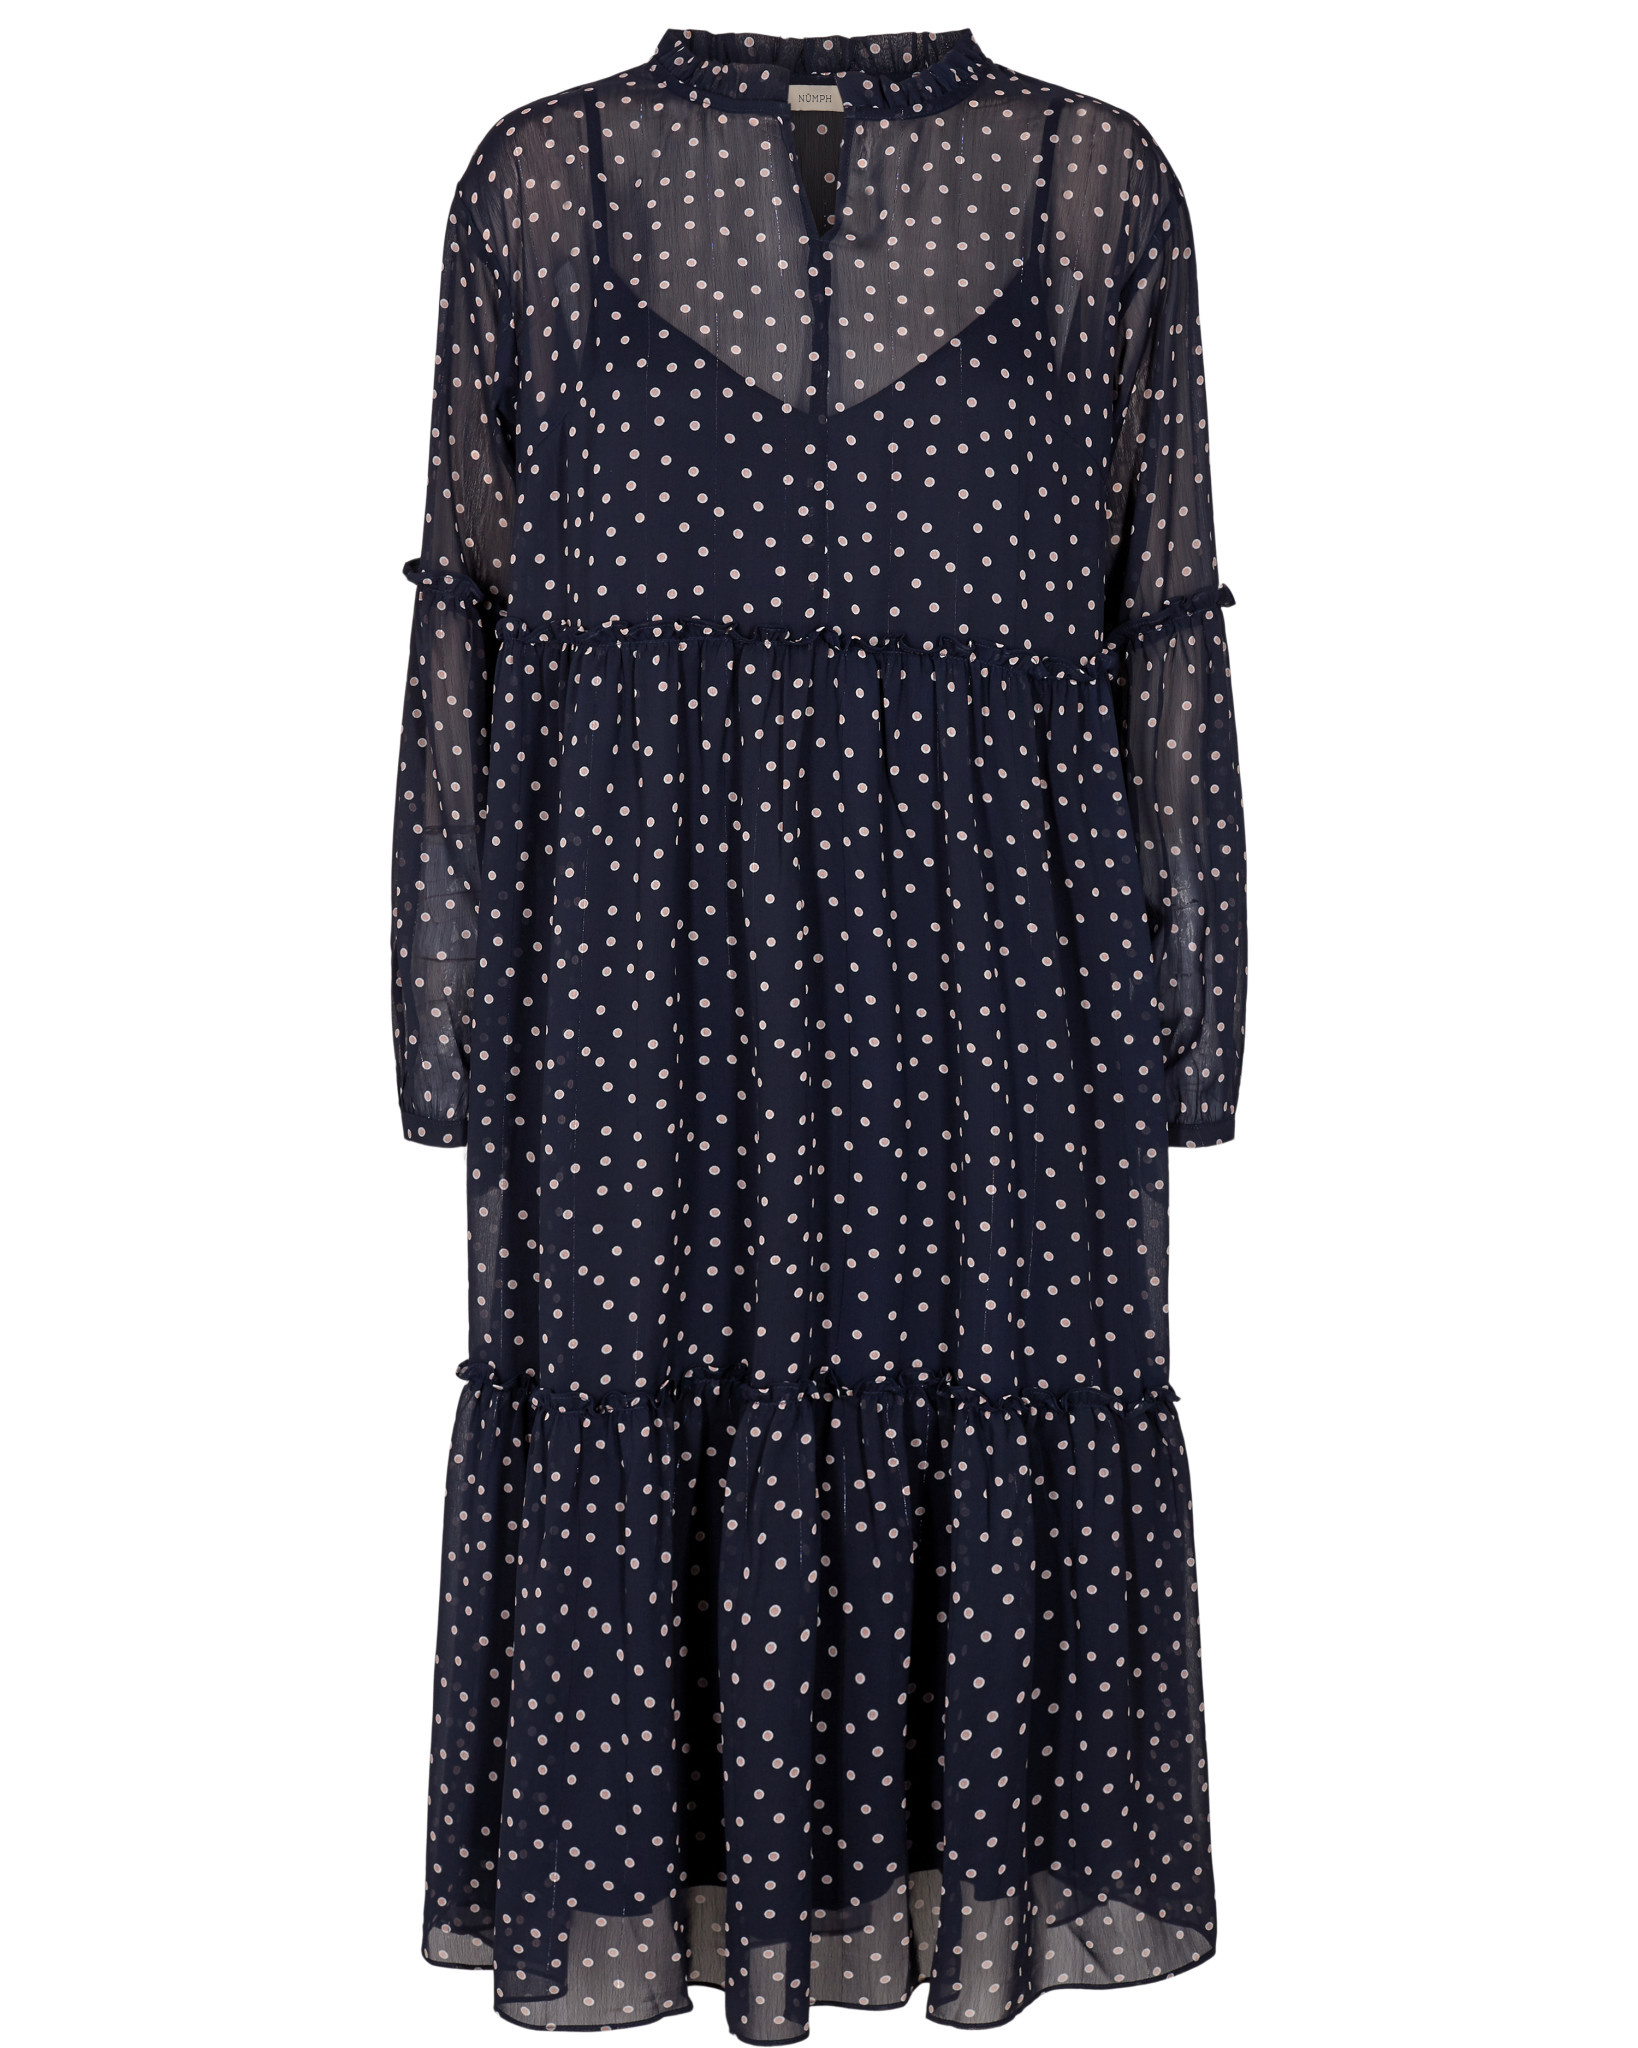 Nümph Nanon Dress - Donkerblauw